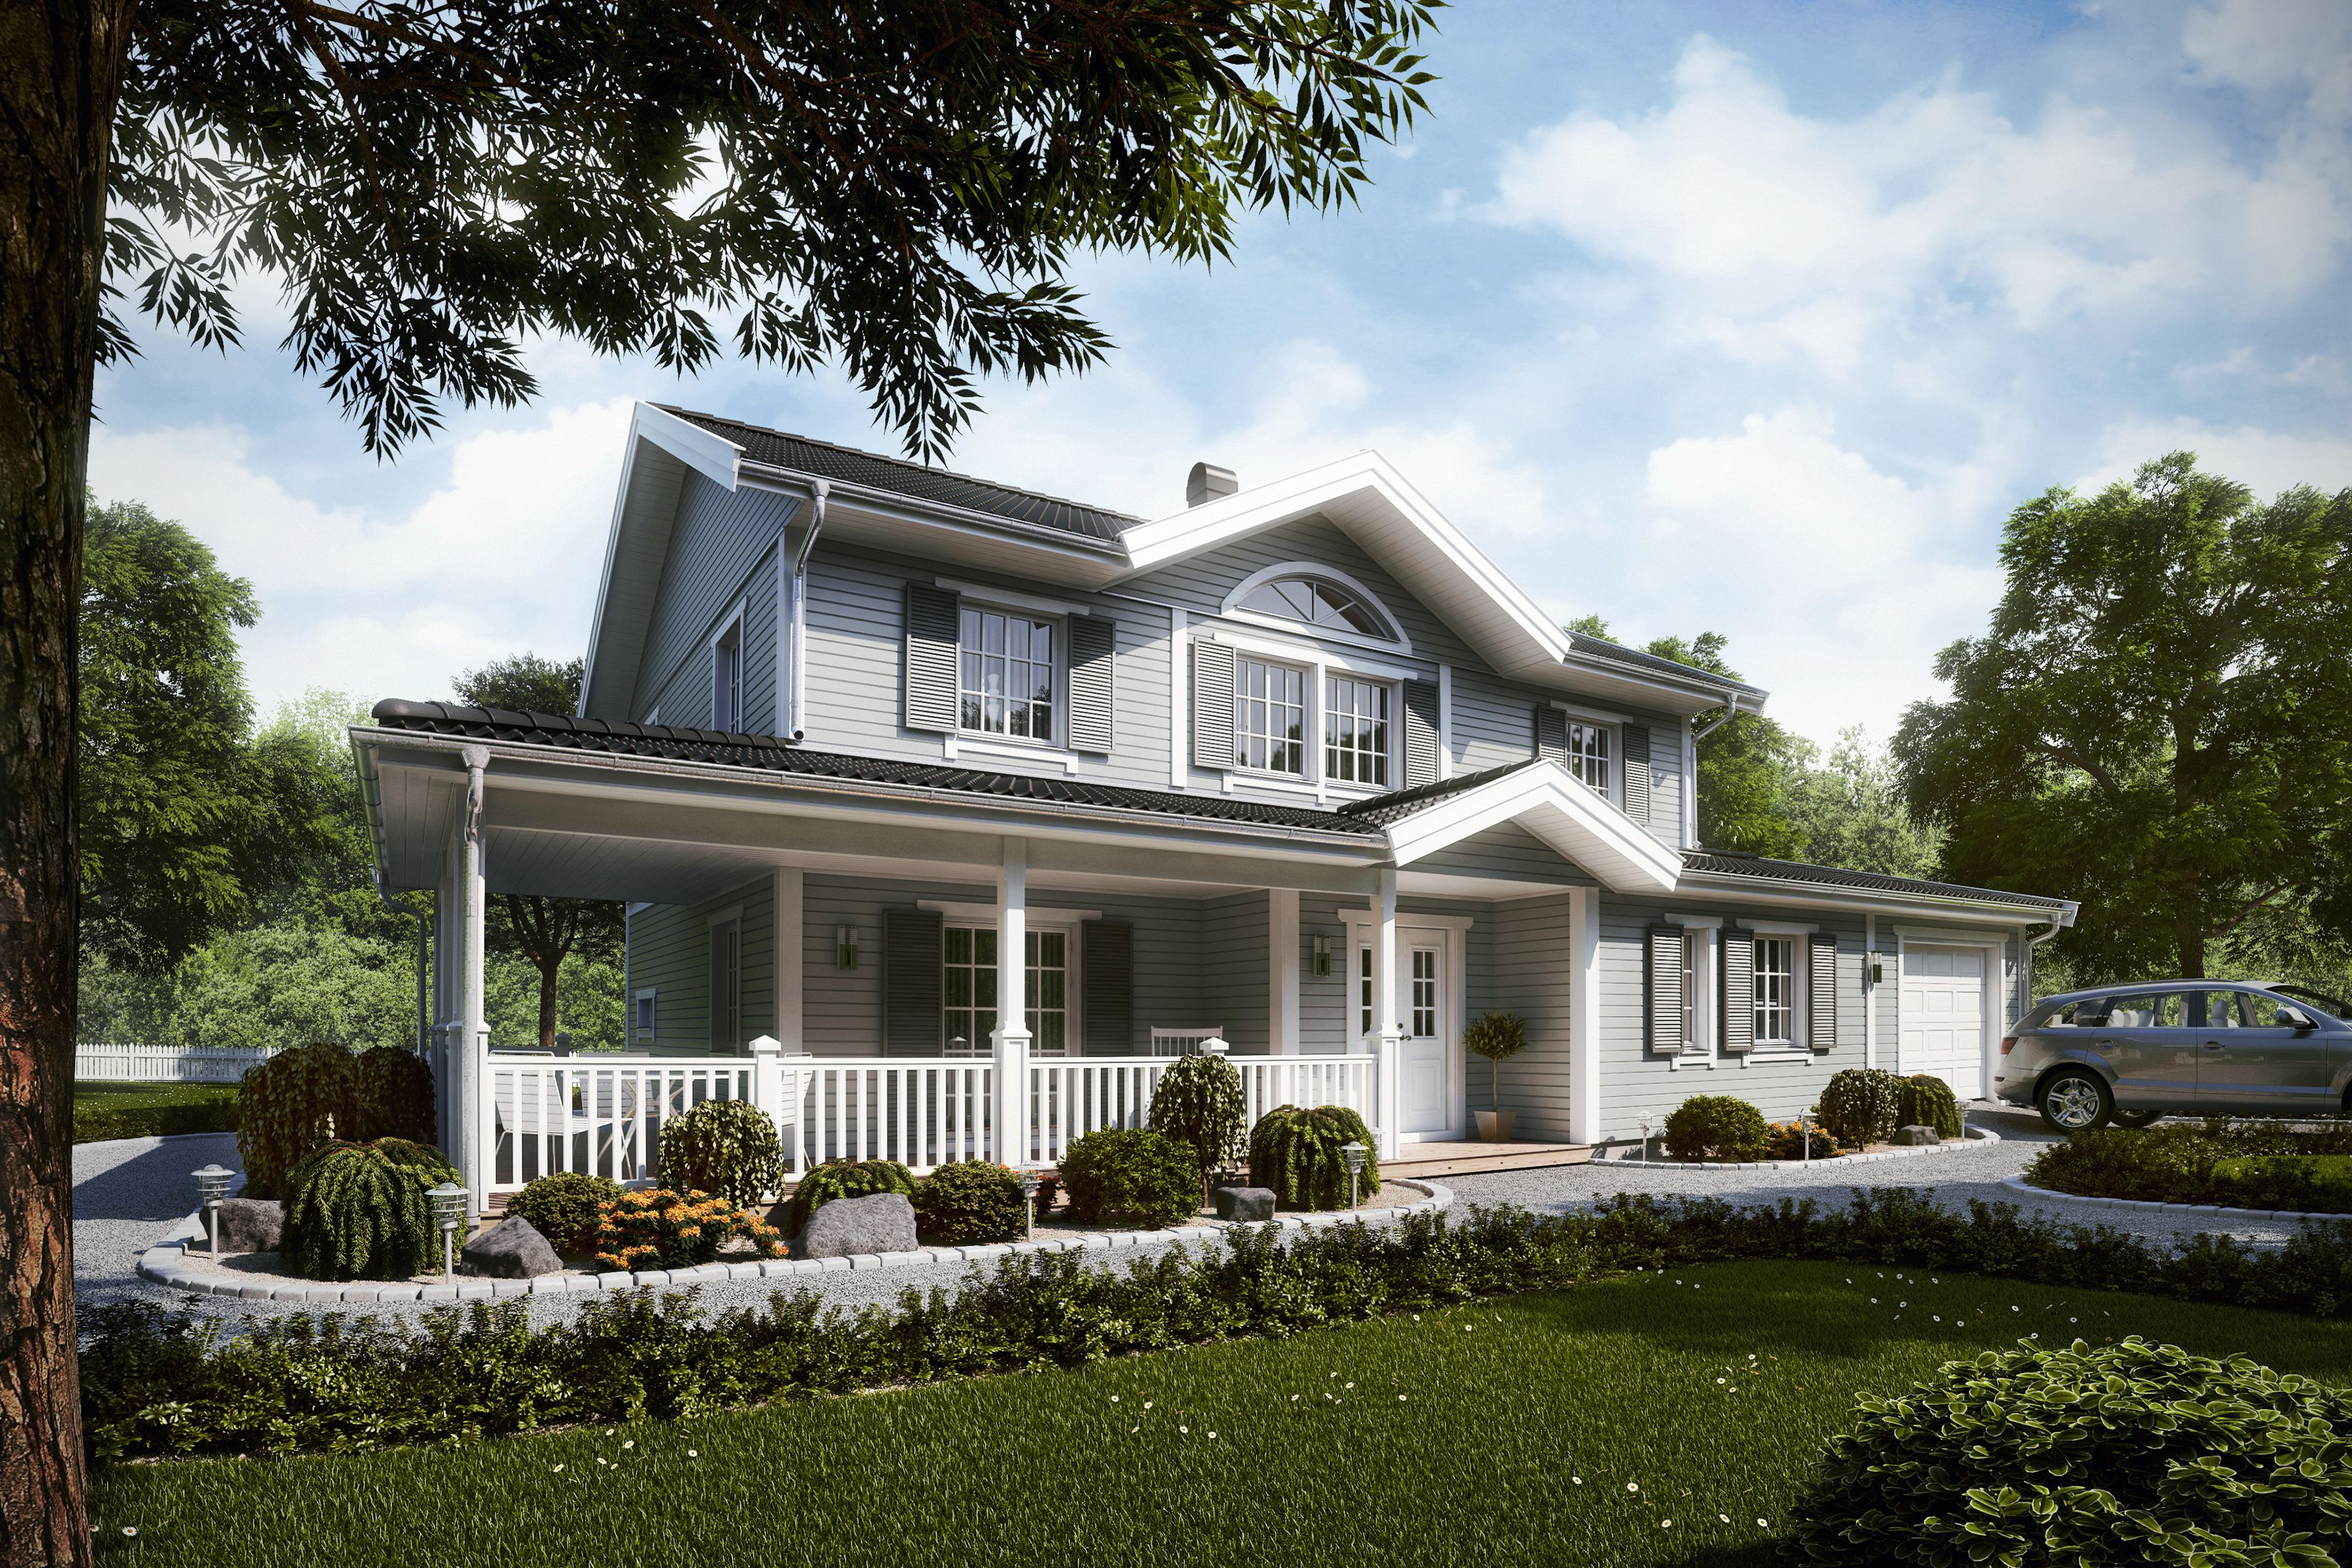 rosenhill eksj hus deutschland home pinterest american houses and house. Black Bedroom Furniture Sets. Home Design Ideas